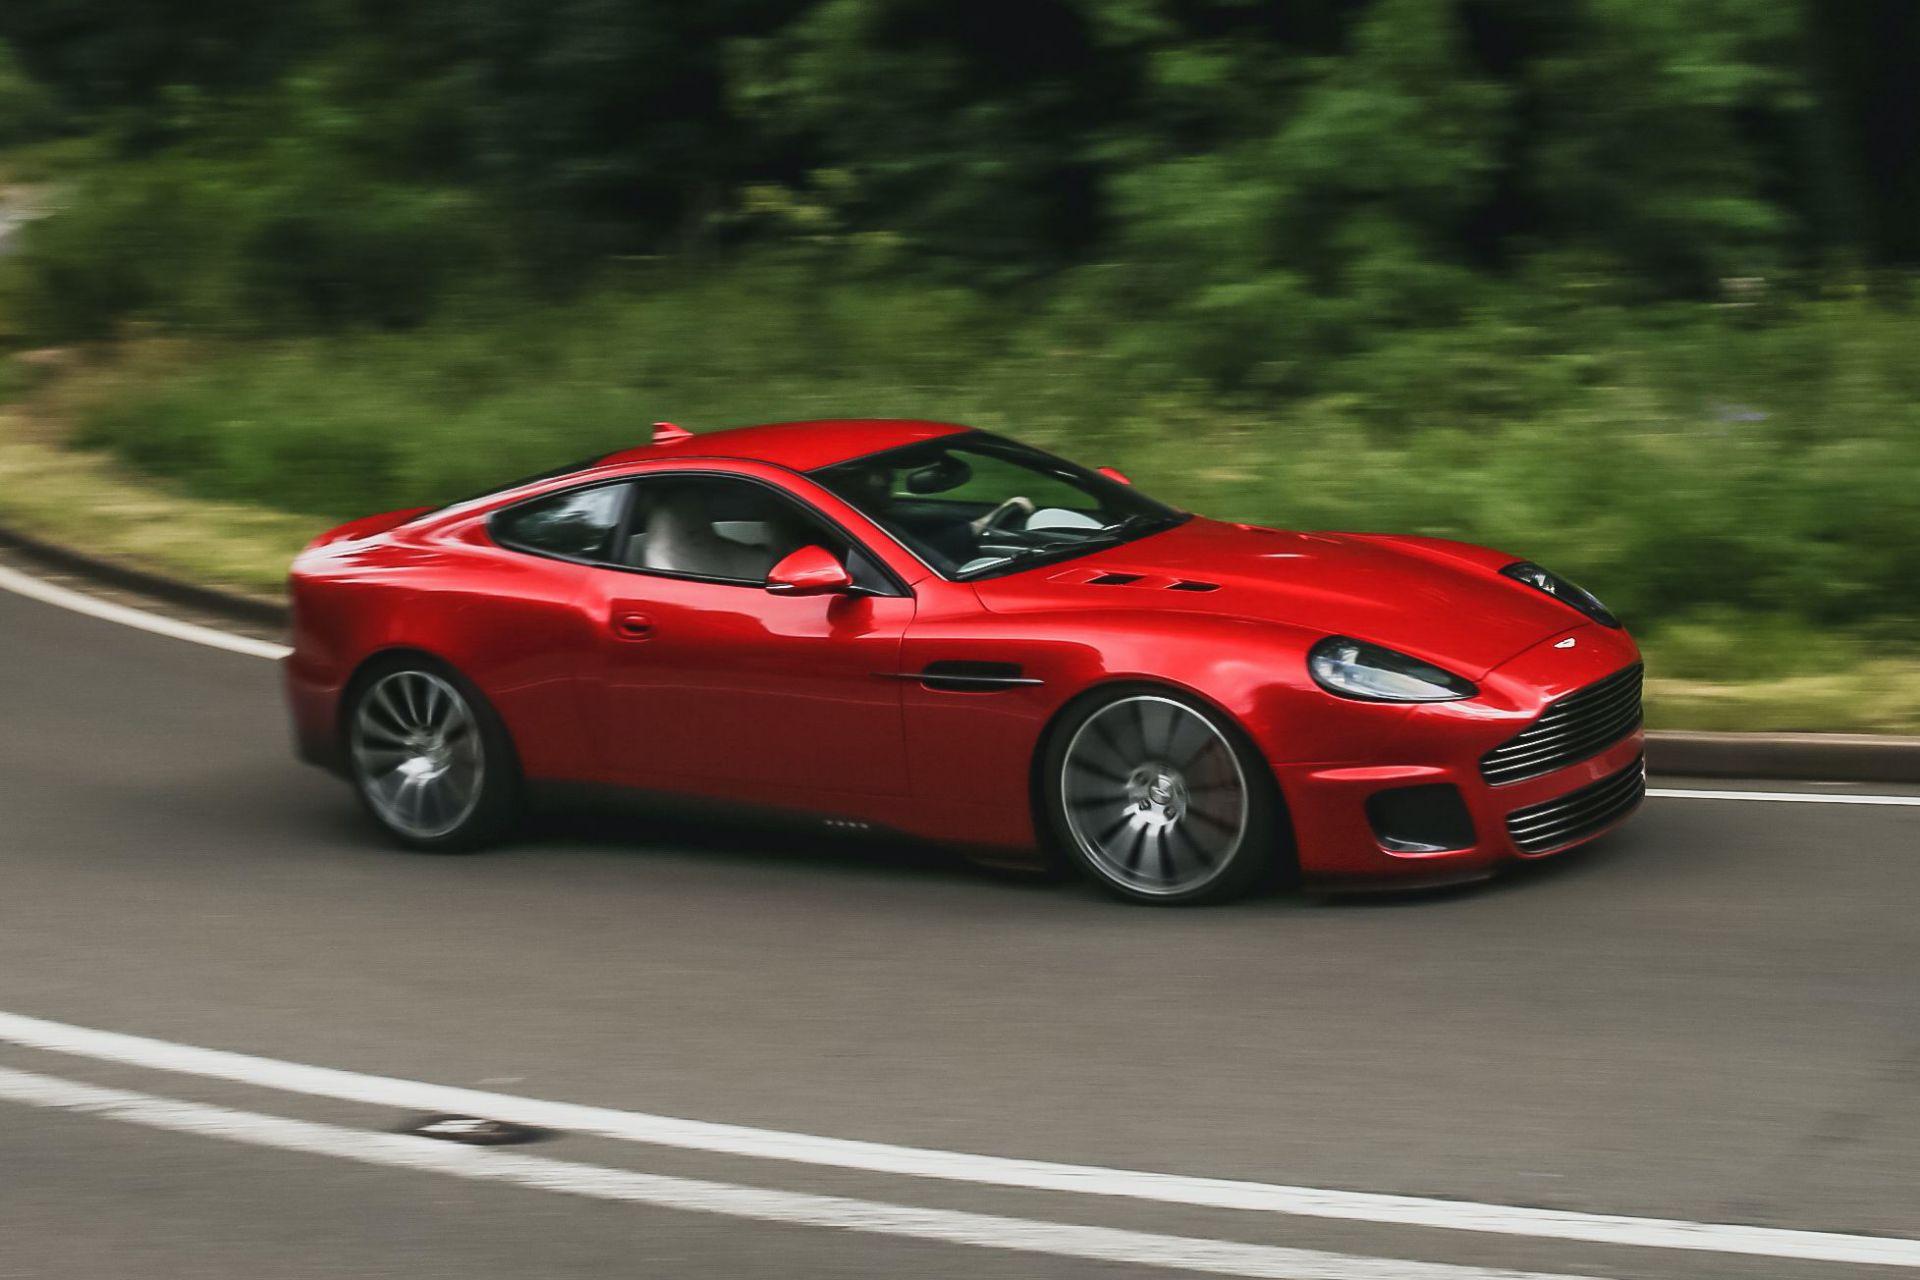 Aston-Martin-Callum-Vanquish-25-By-R-Reforged-2